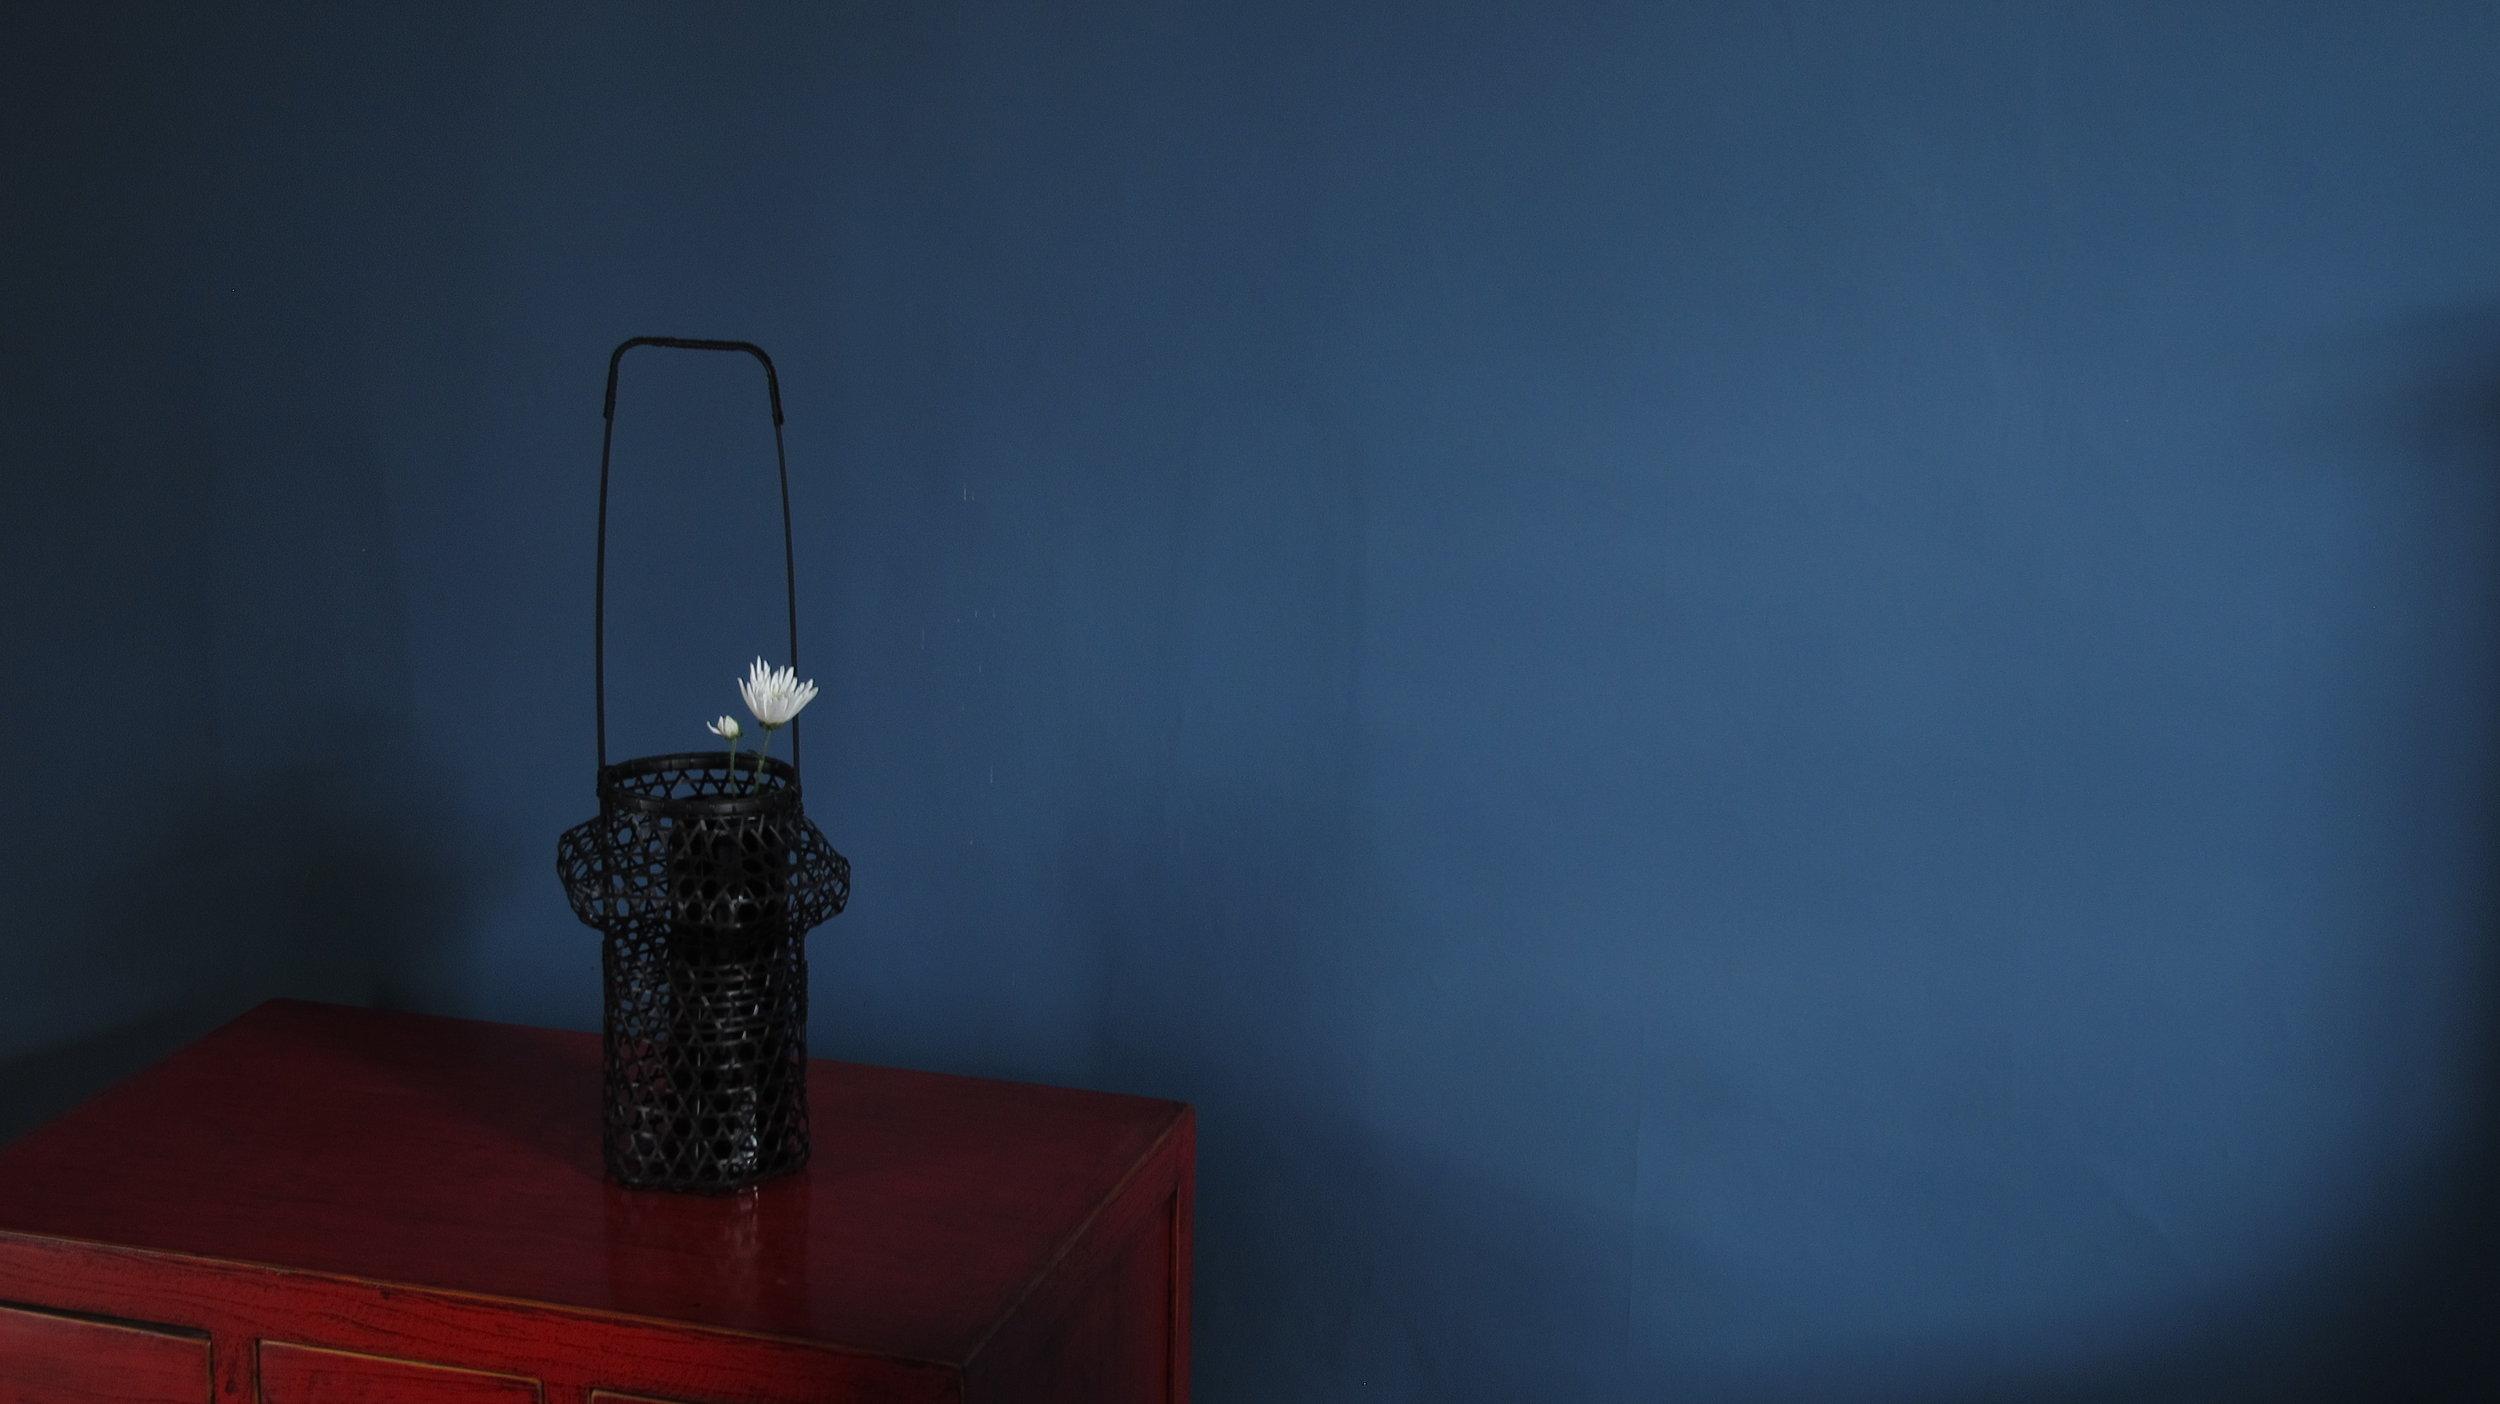 Bamboo Flower Basket by Chikuseido